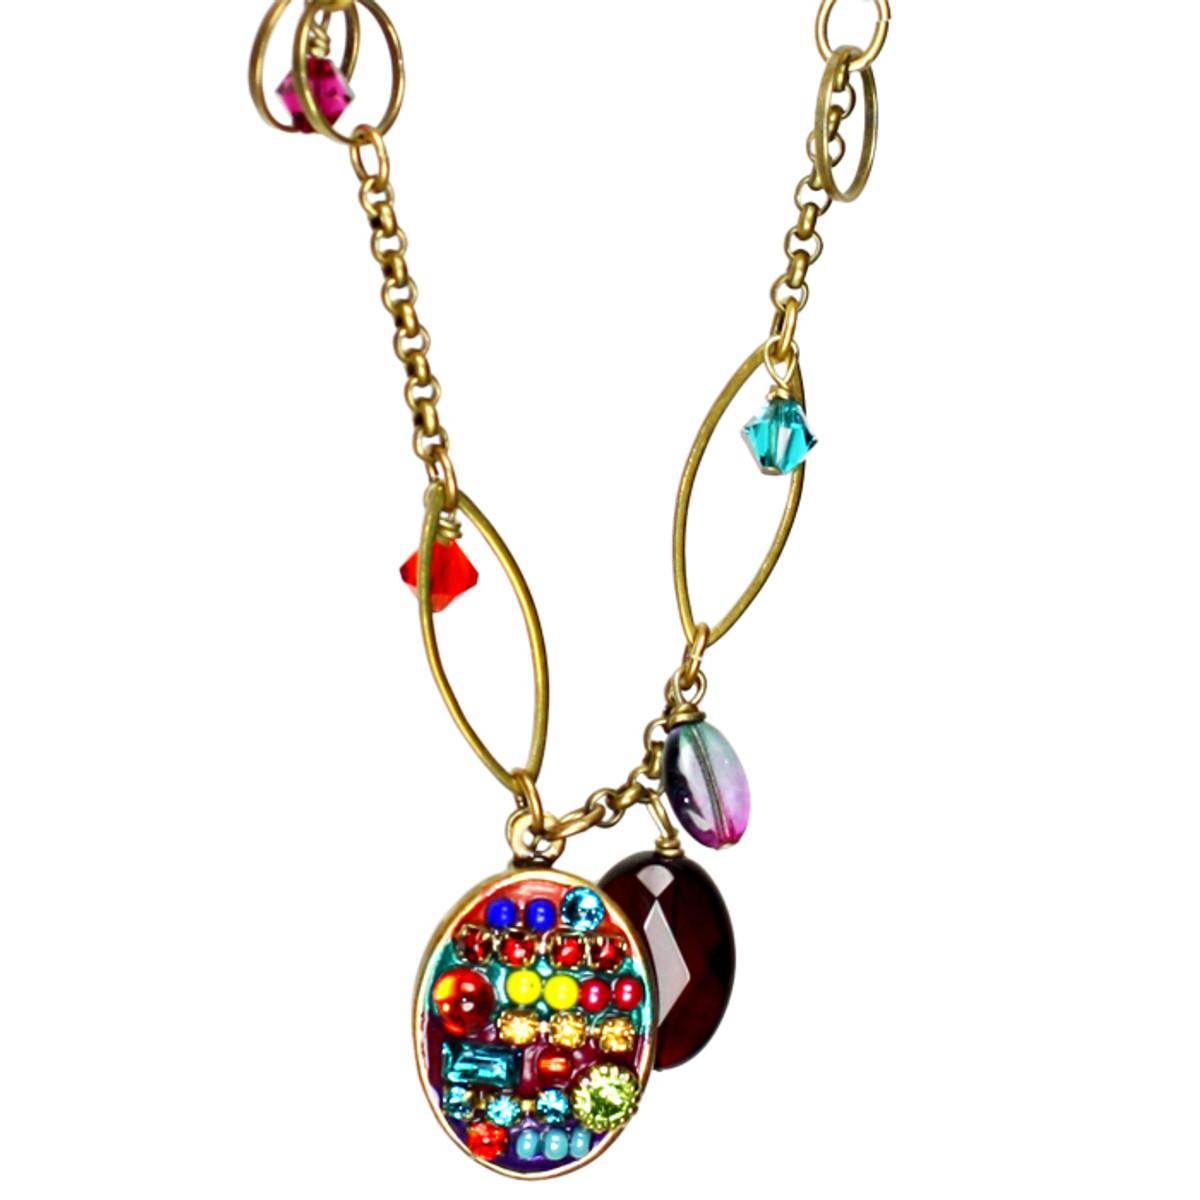 Michal Golan Necklace - Multibright Small Oval Chain Dangle Bead